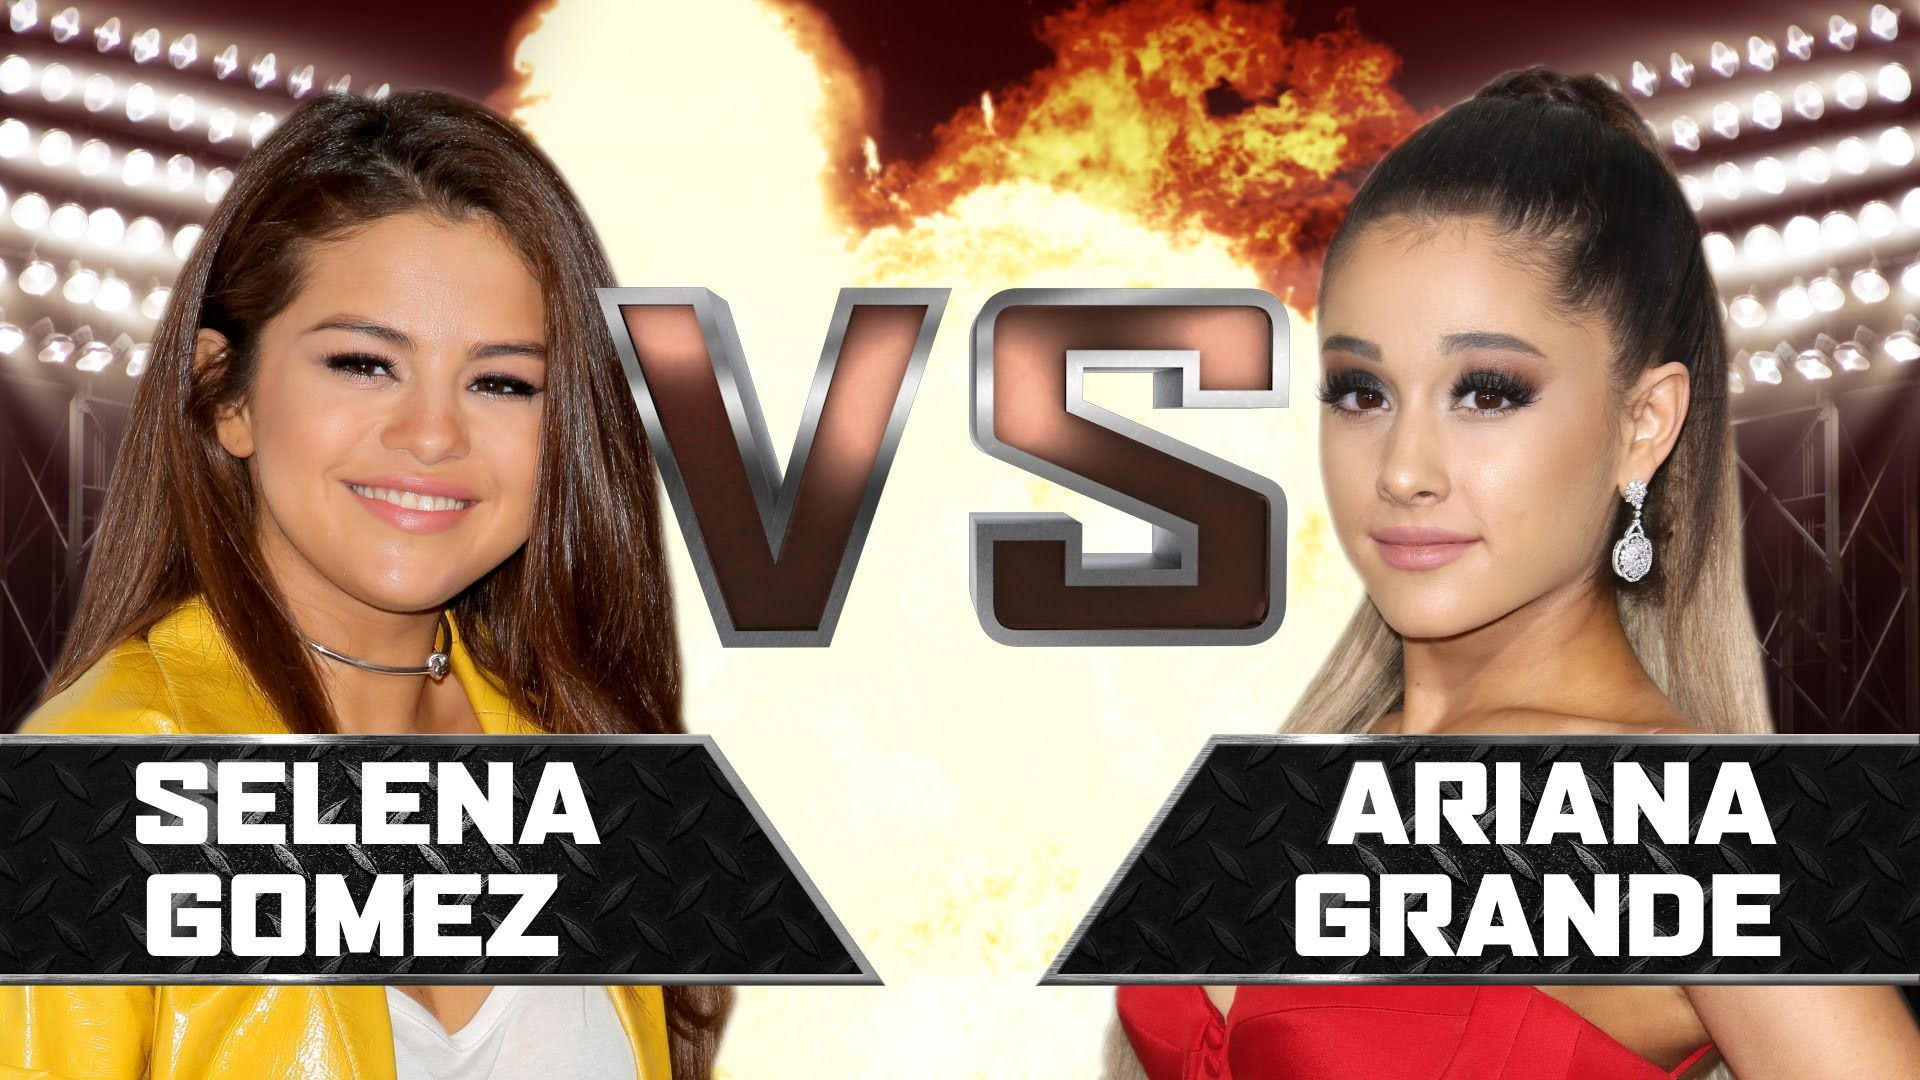 Selena Gomez VS Ariana Grande YouTubers Decide